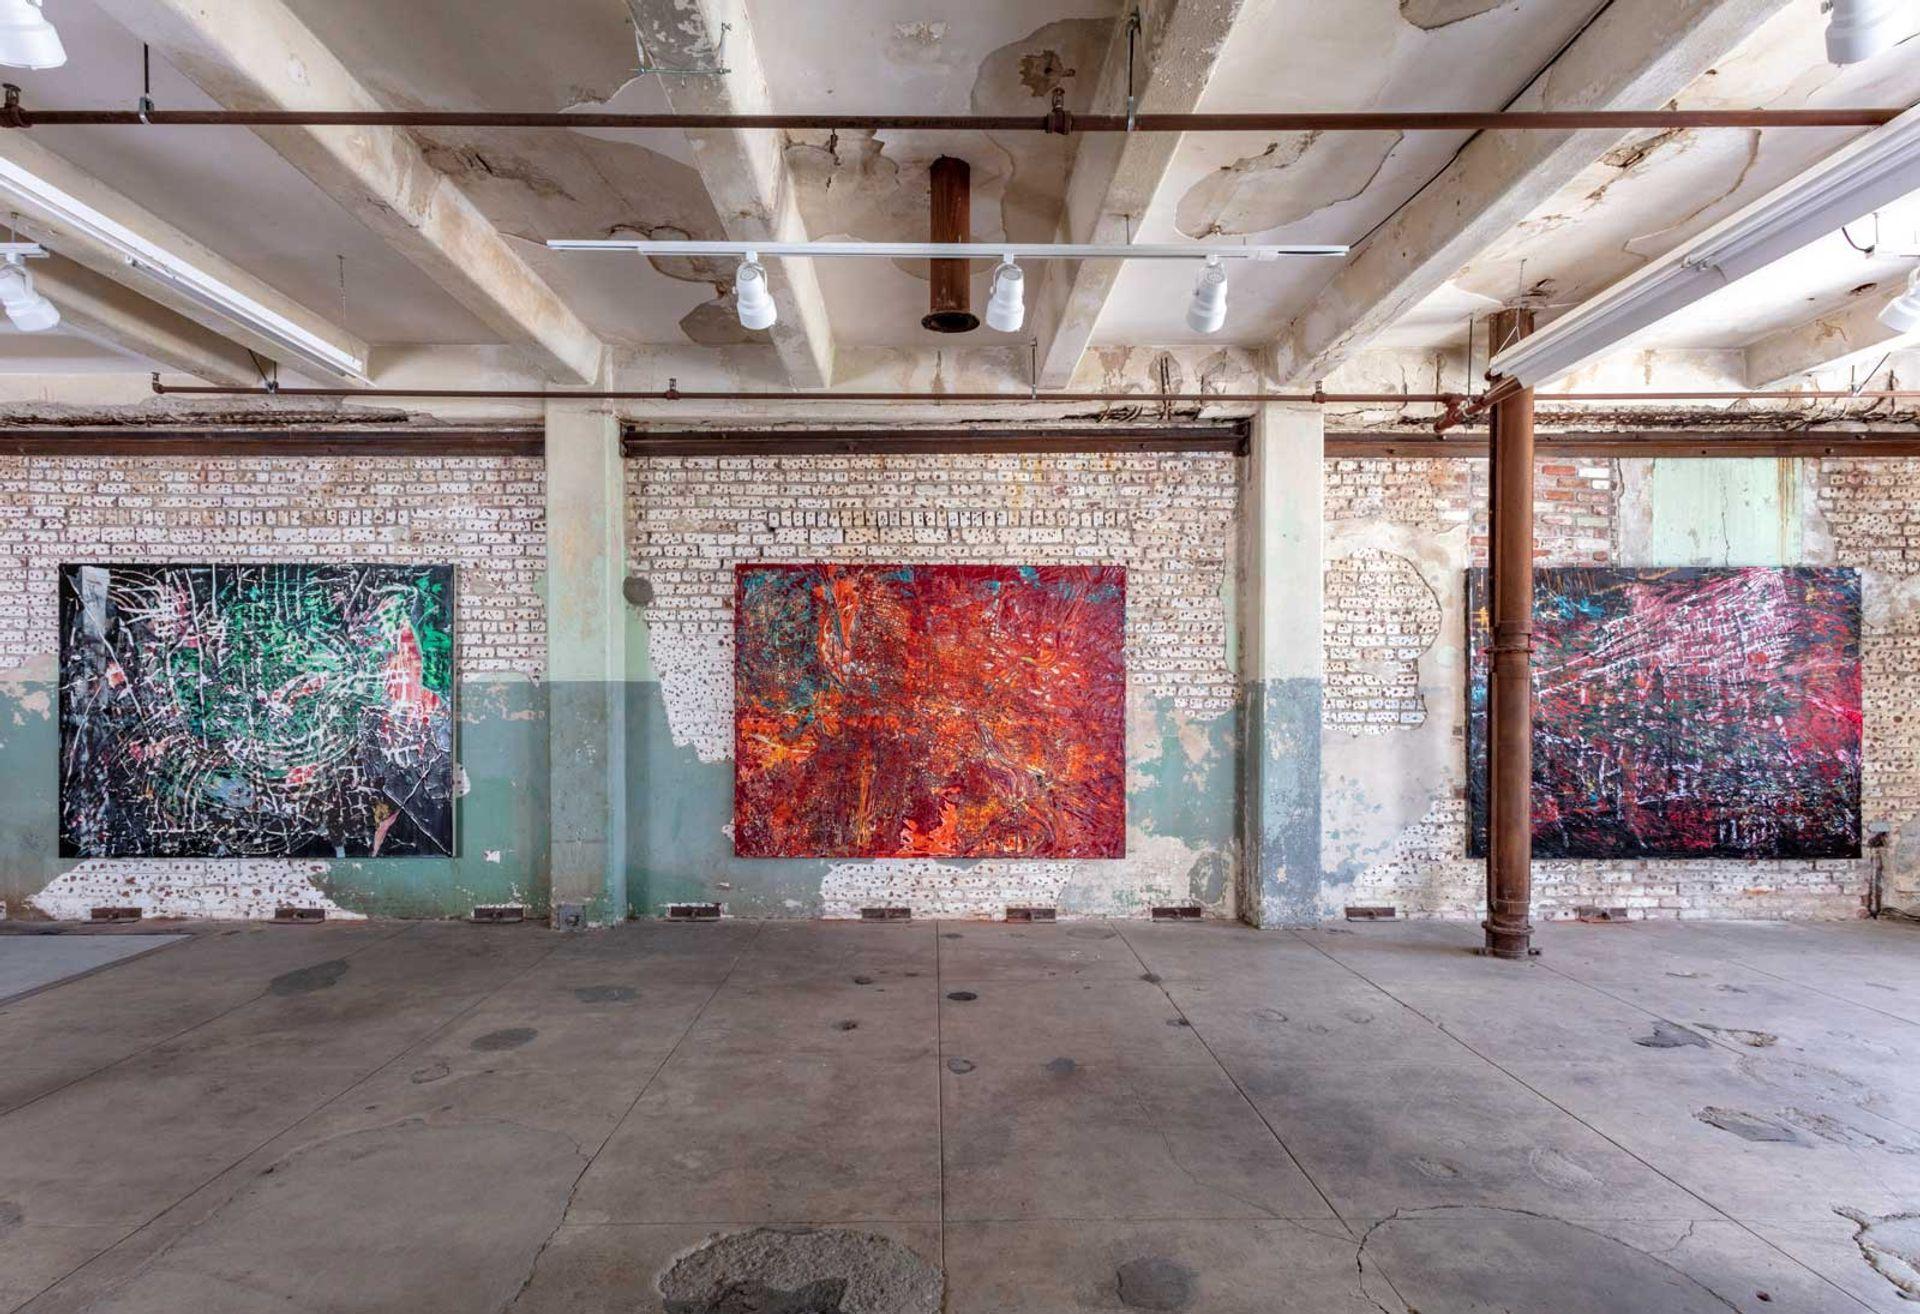 Installation view, Mark Bradford: Quarantine Paintings, Hauser & Wirth Los Angeles, 2020 © Mark Bradford Courtesy the artist and Hauser & Wirth Photo: Joshua White / JWPictures